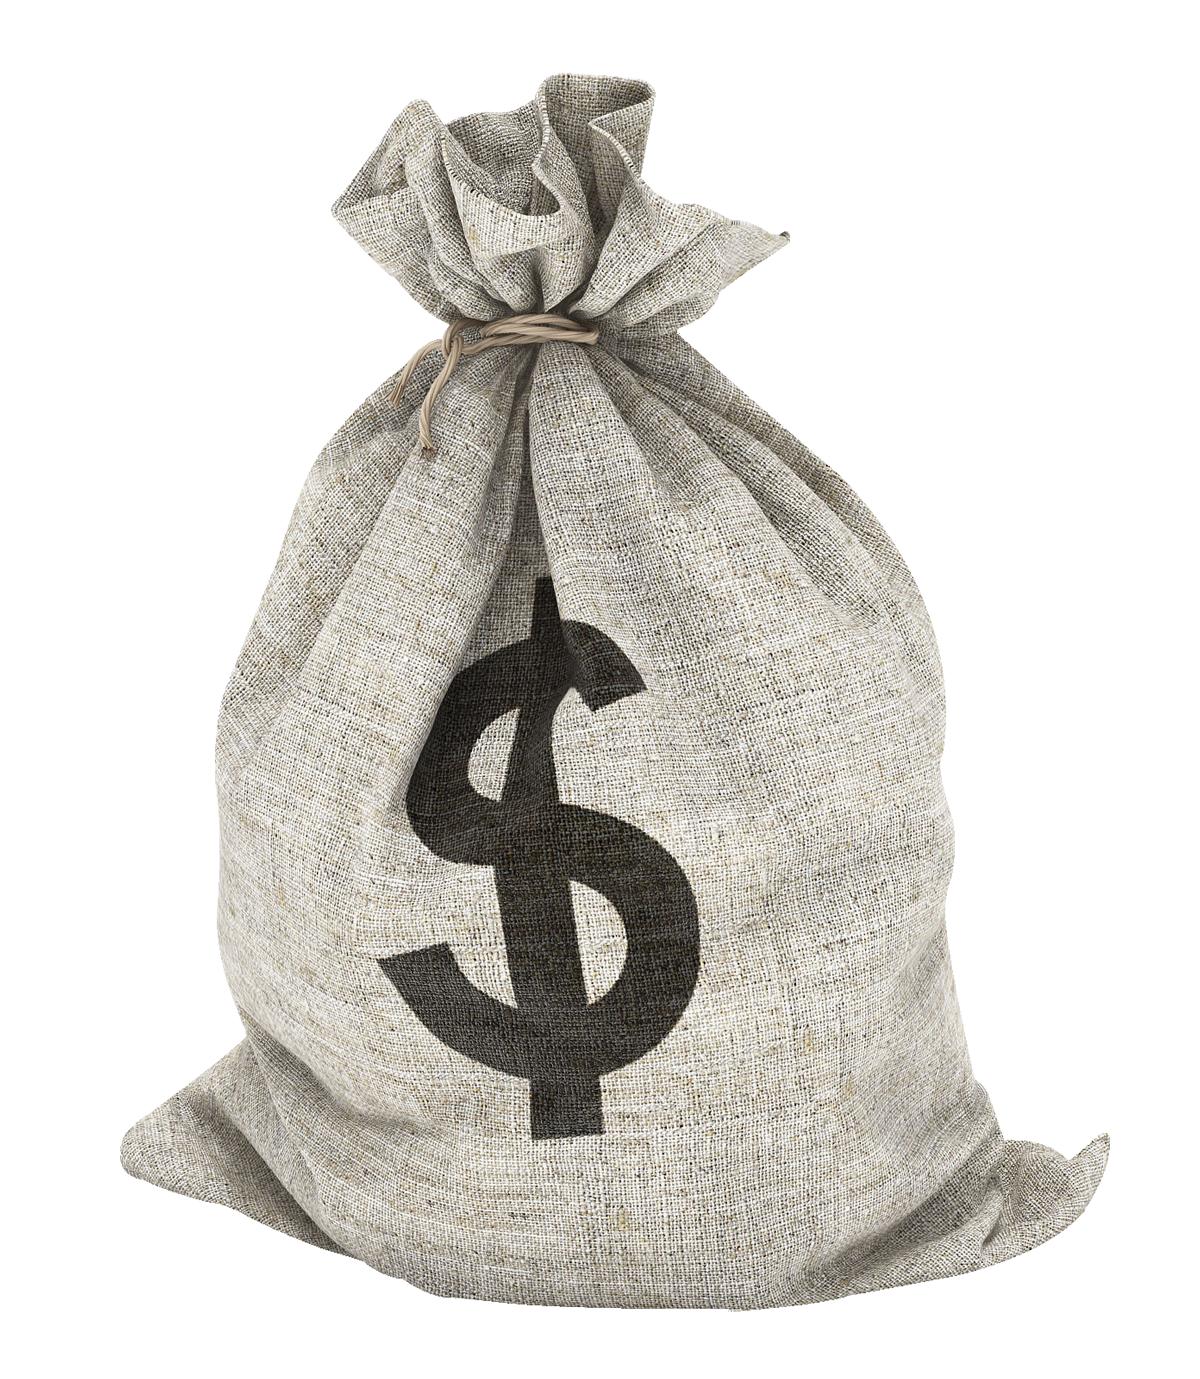 Money Bag PNG Image - PurePNG | Free transparent CC0 PNG ... - Dollar Sign Money Bag